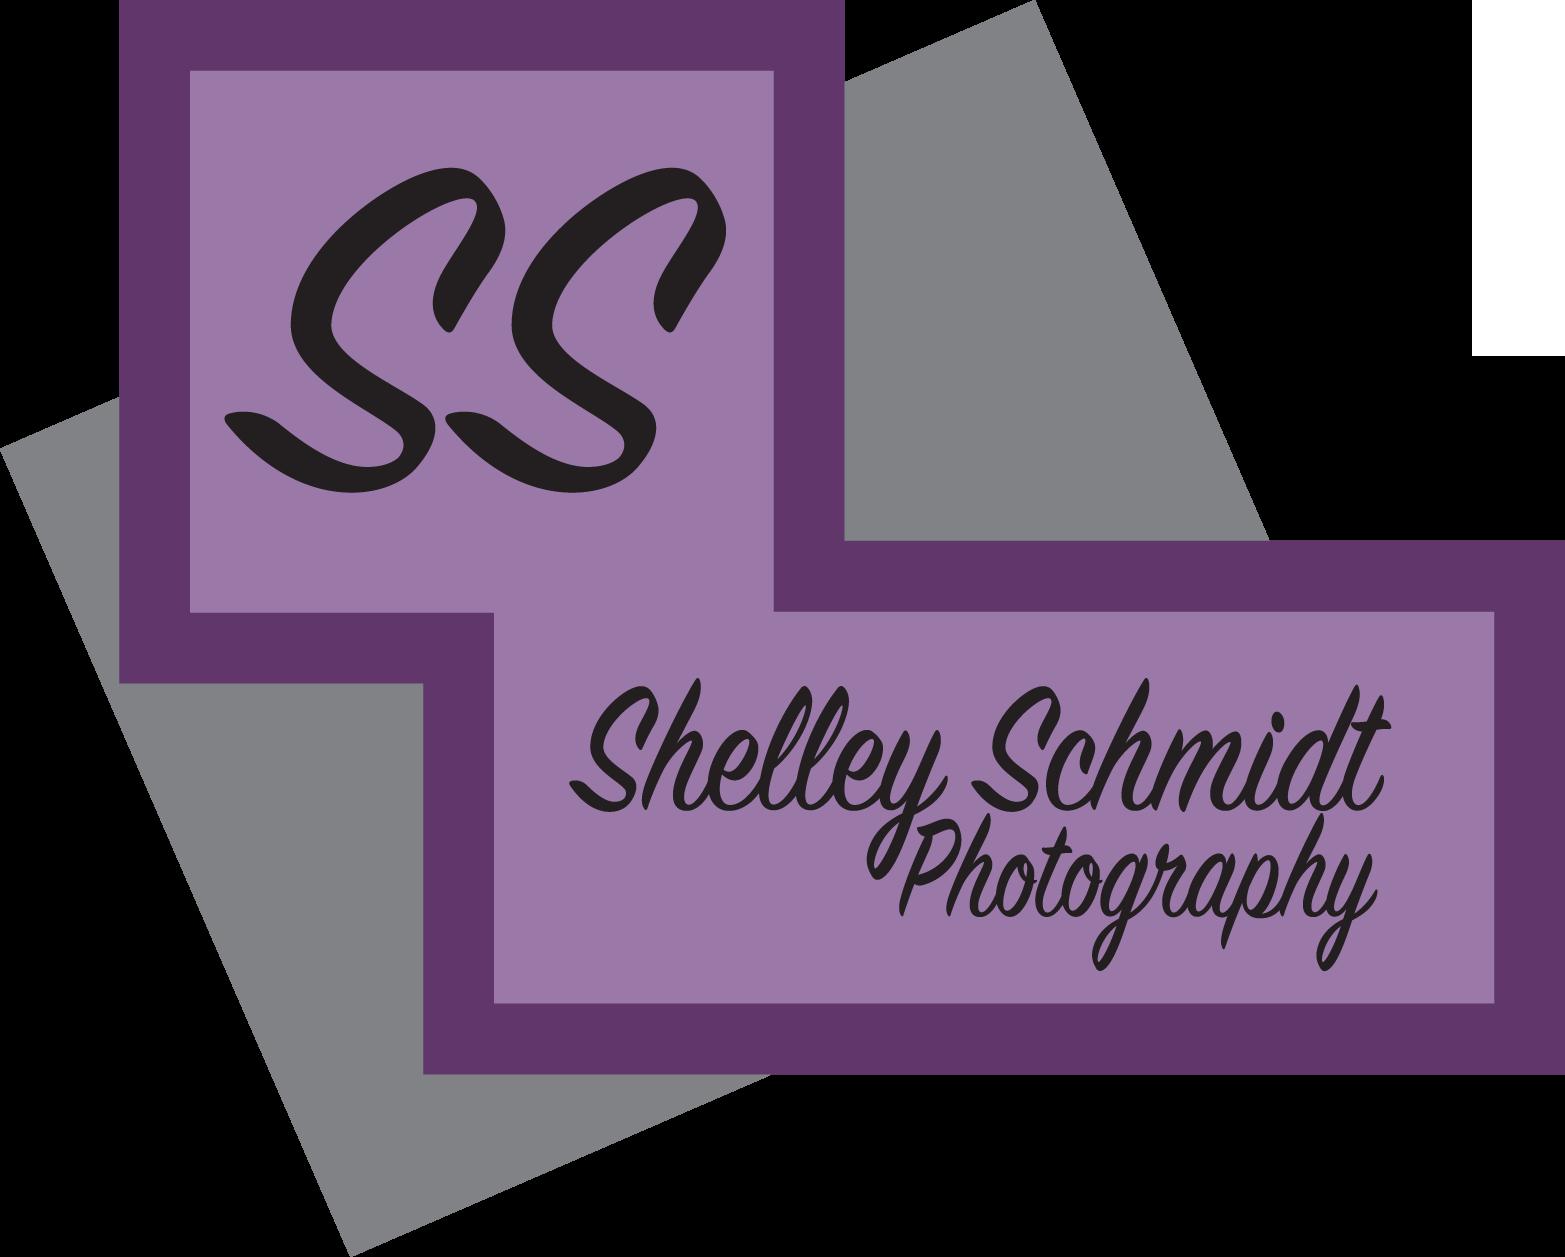 Shelley Schmidt Photography